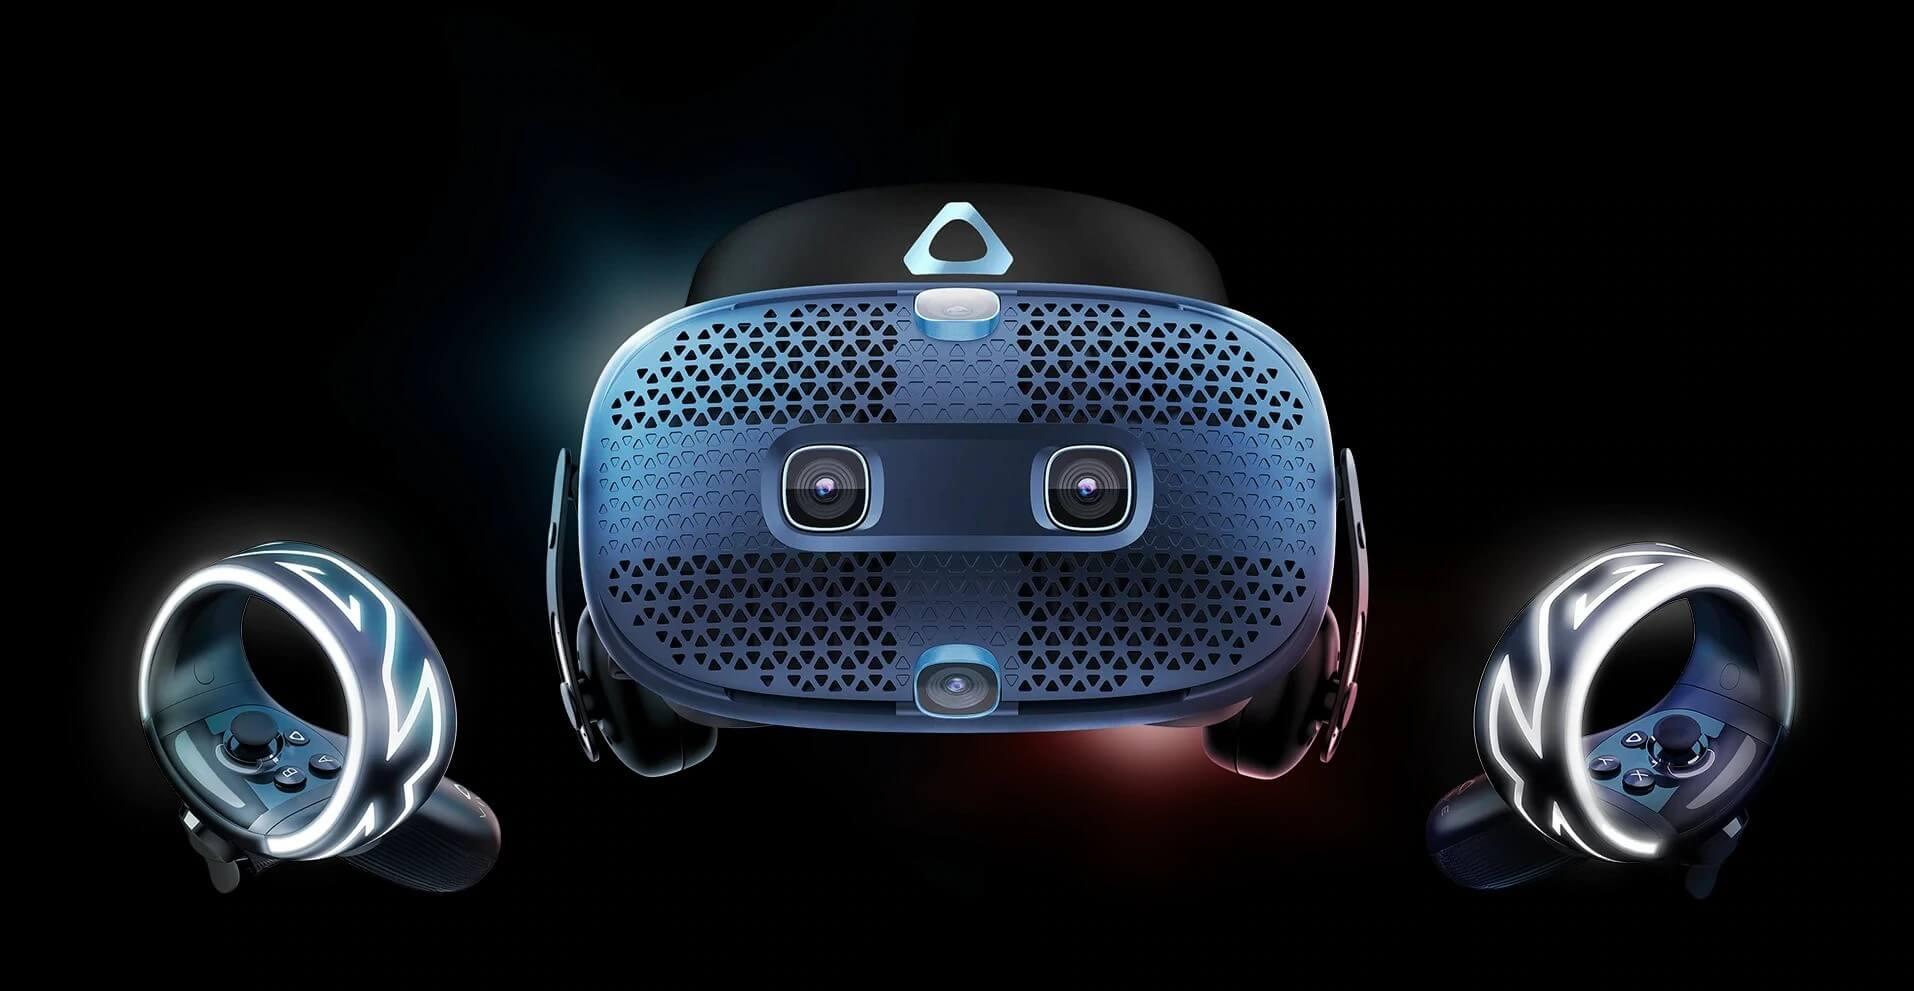 HTC esittelee kolme Vive Cosmos VR -kuuloketta ja todellisuuslaseja …